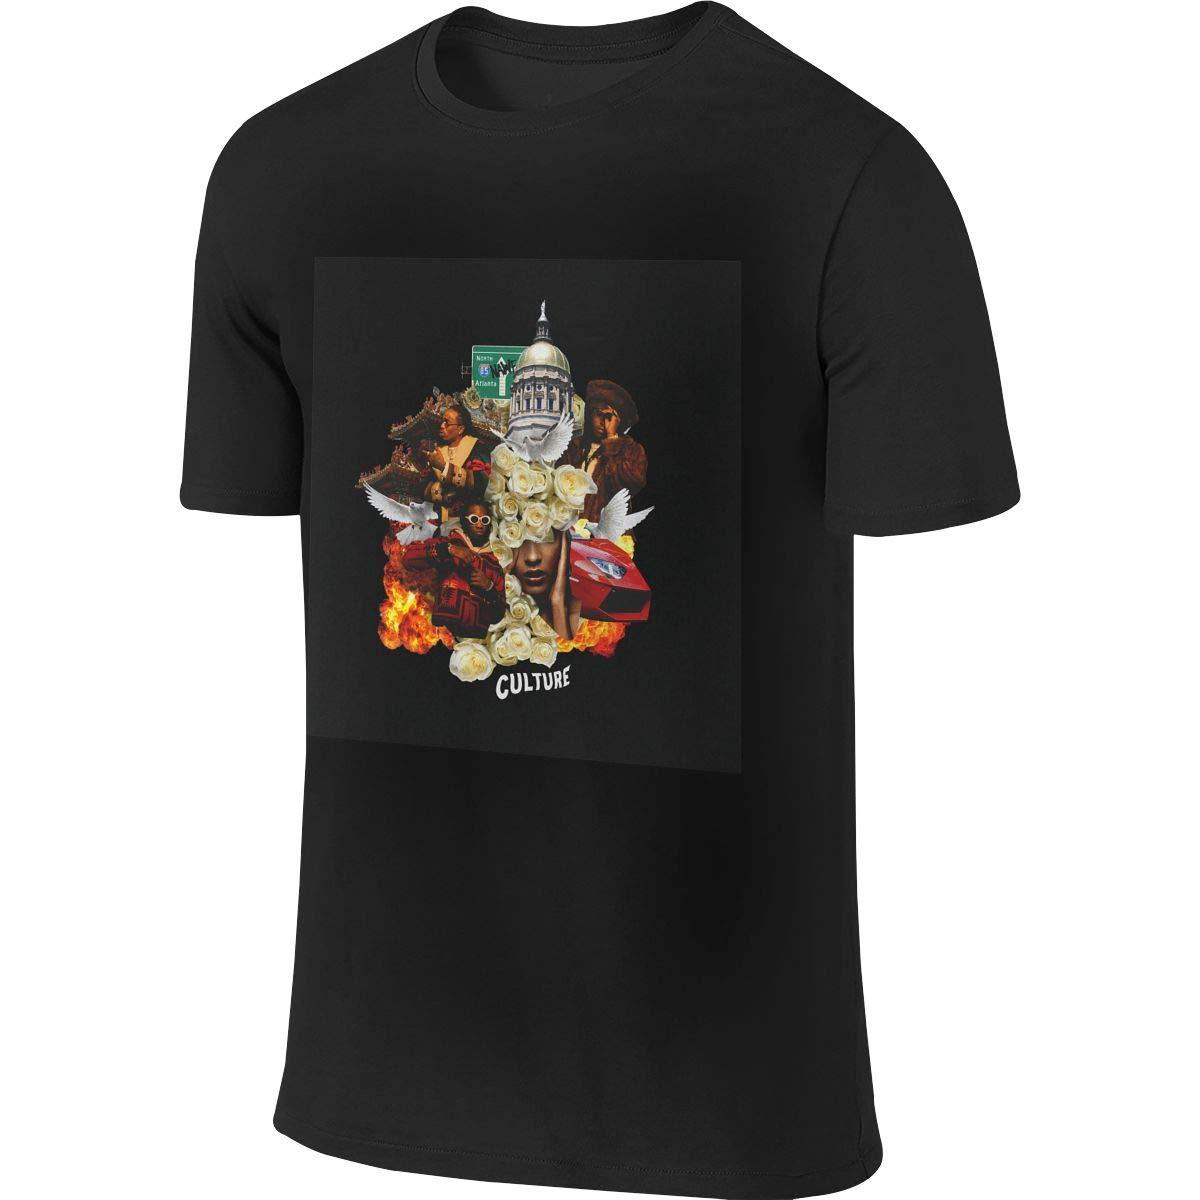 Natalie B Phillips Mans Migos Culture Band Music Theme Short Sleeves T Shirt 1424